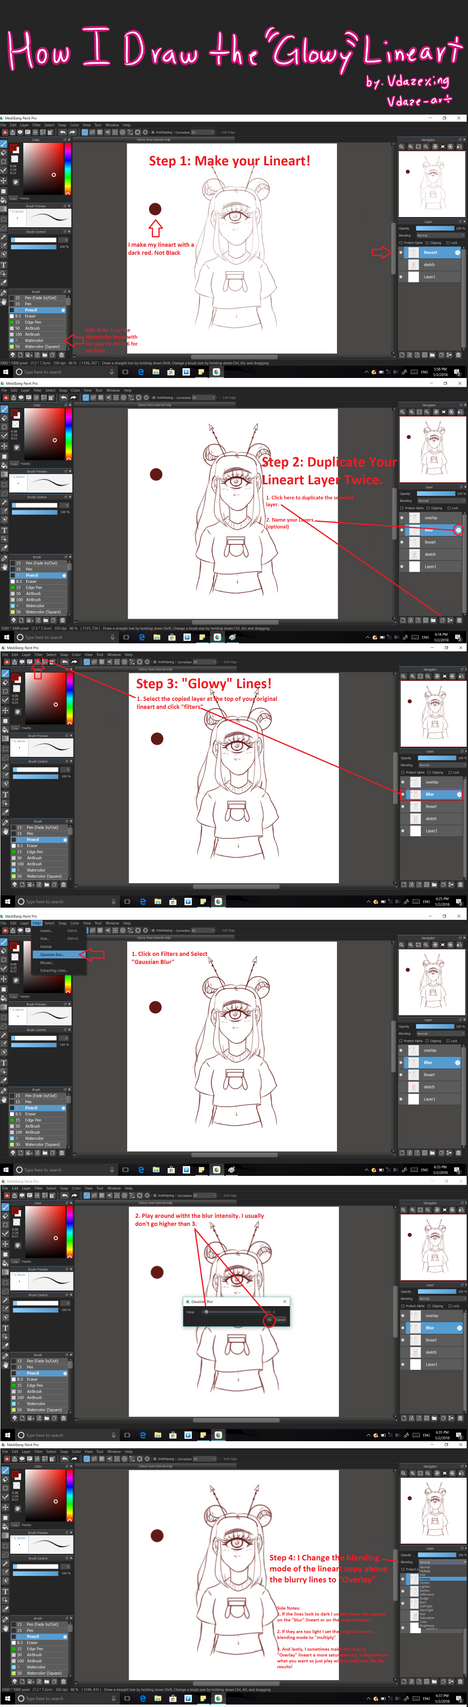 How I do my line work (Medibang Paint) by vdaze-art